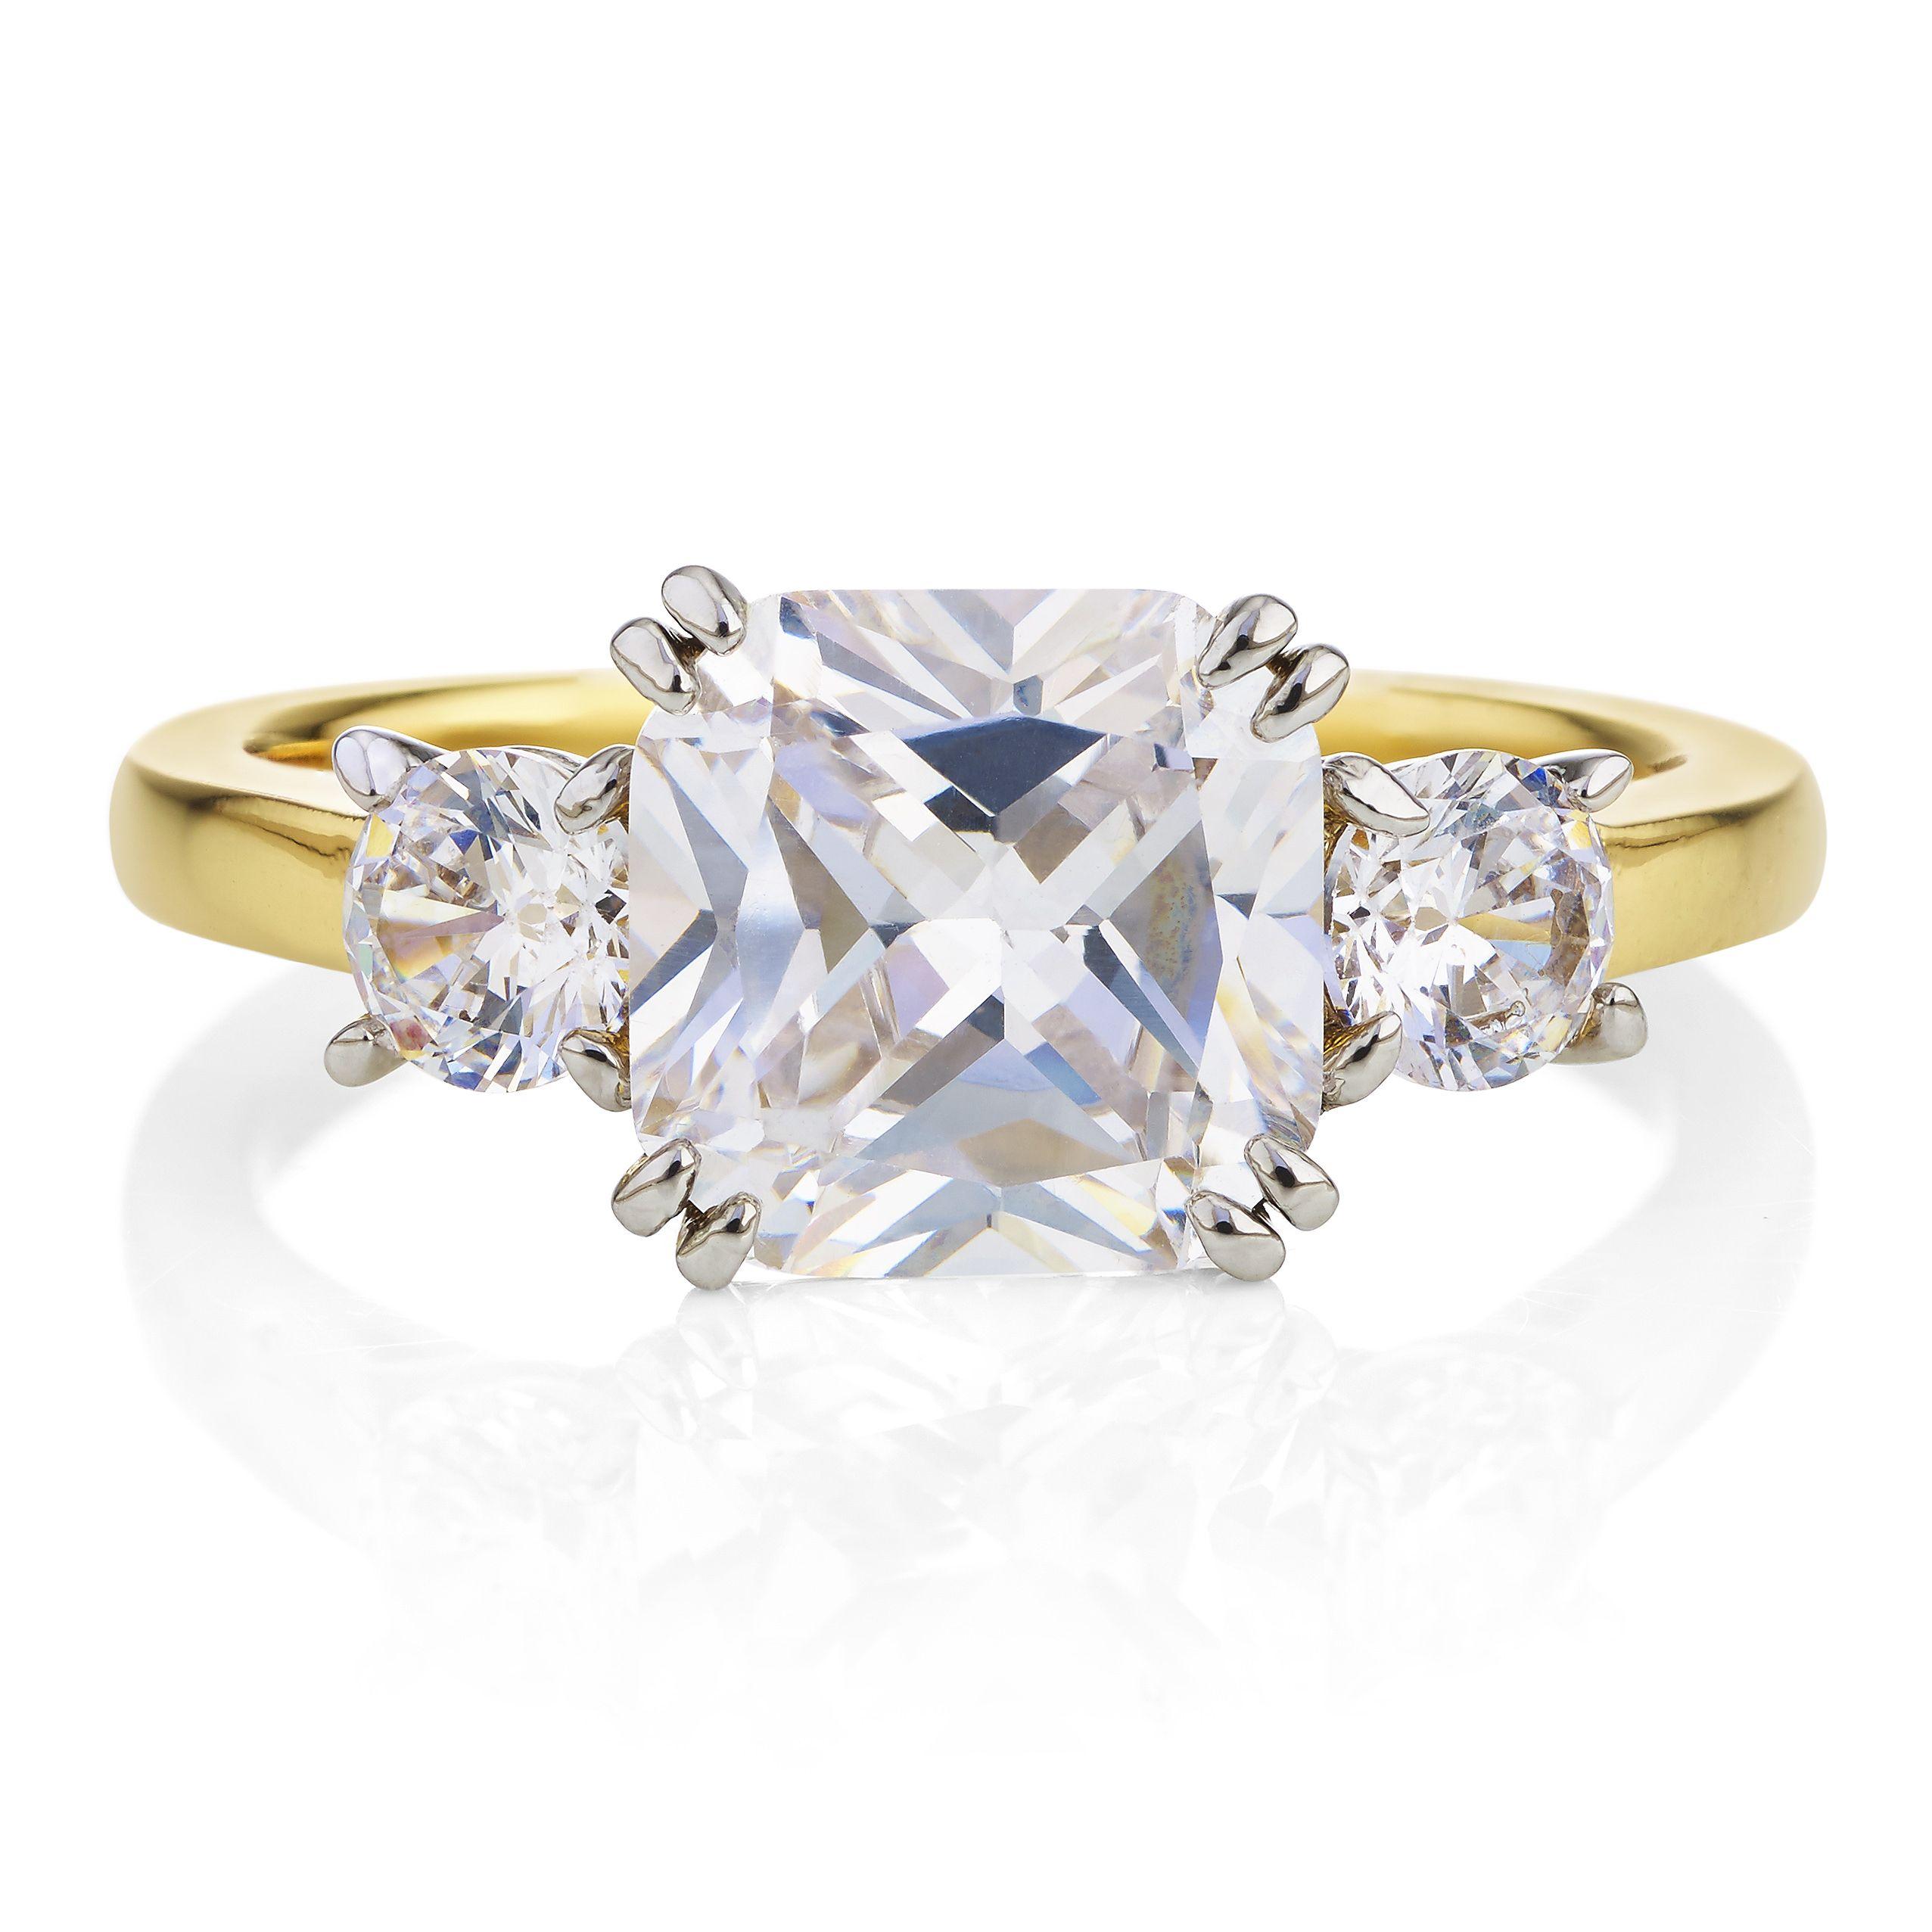 Meghan Markle Ring - Large